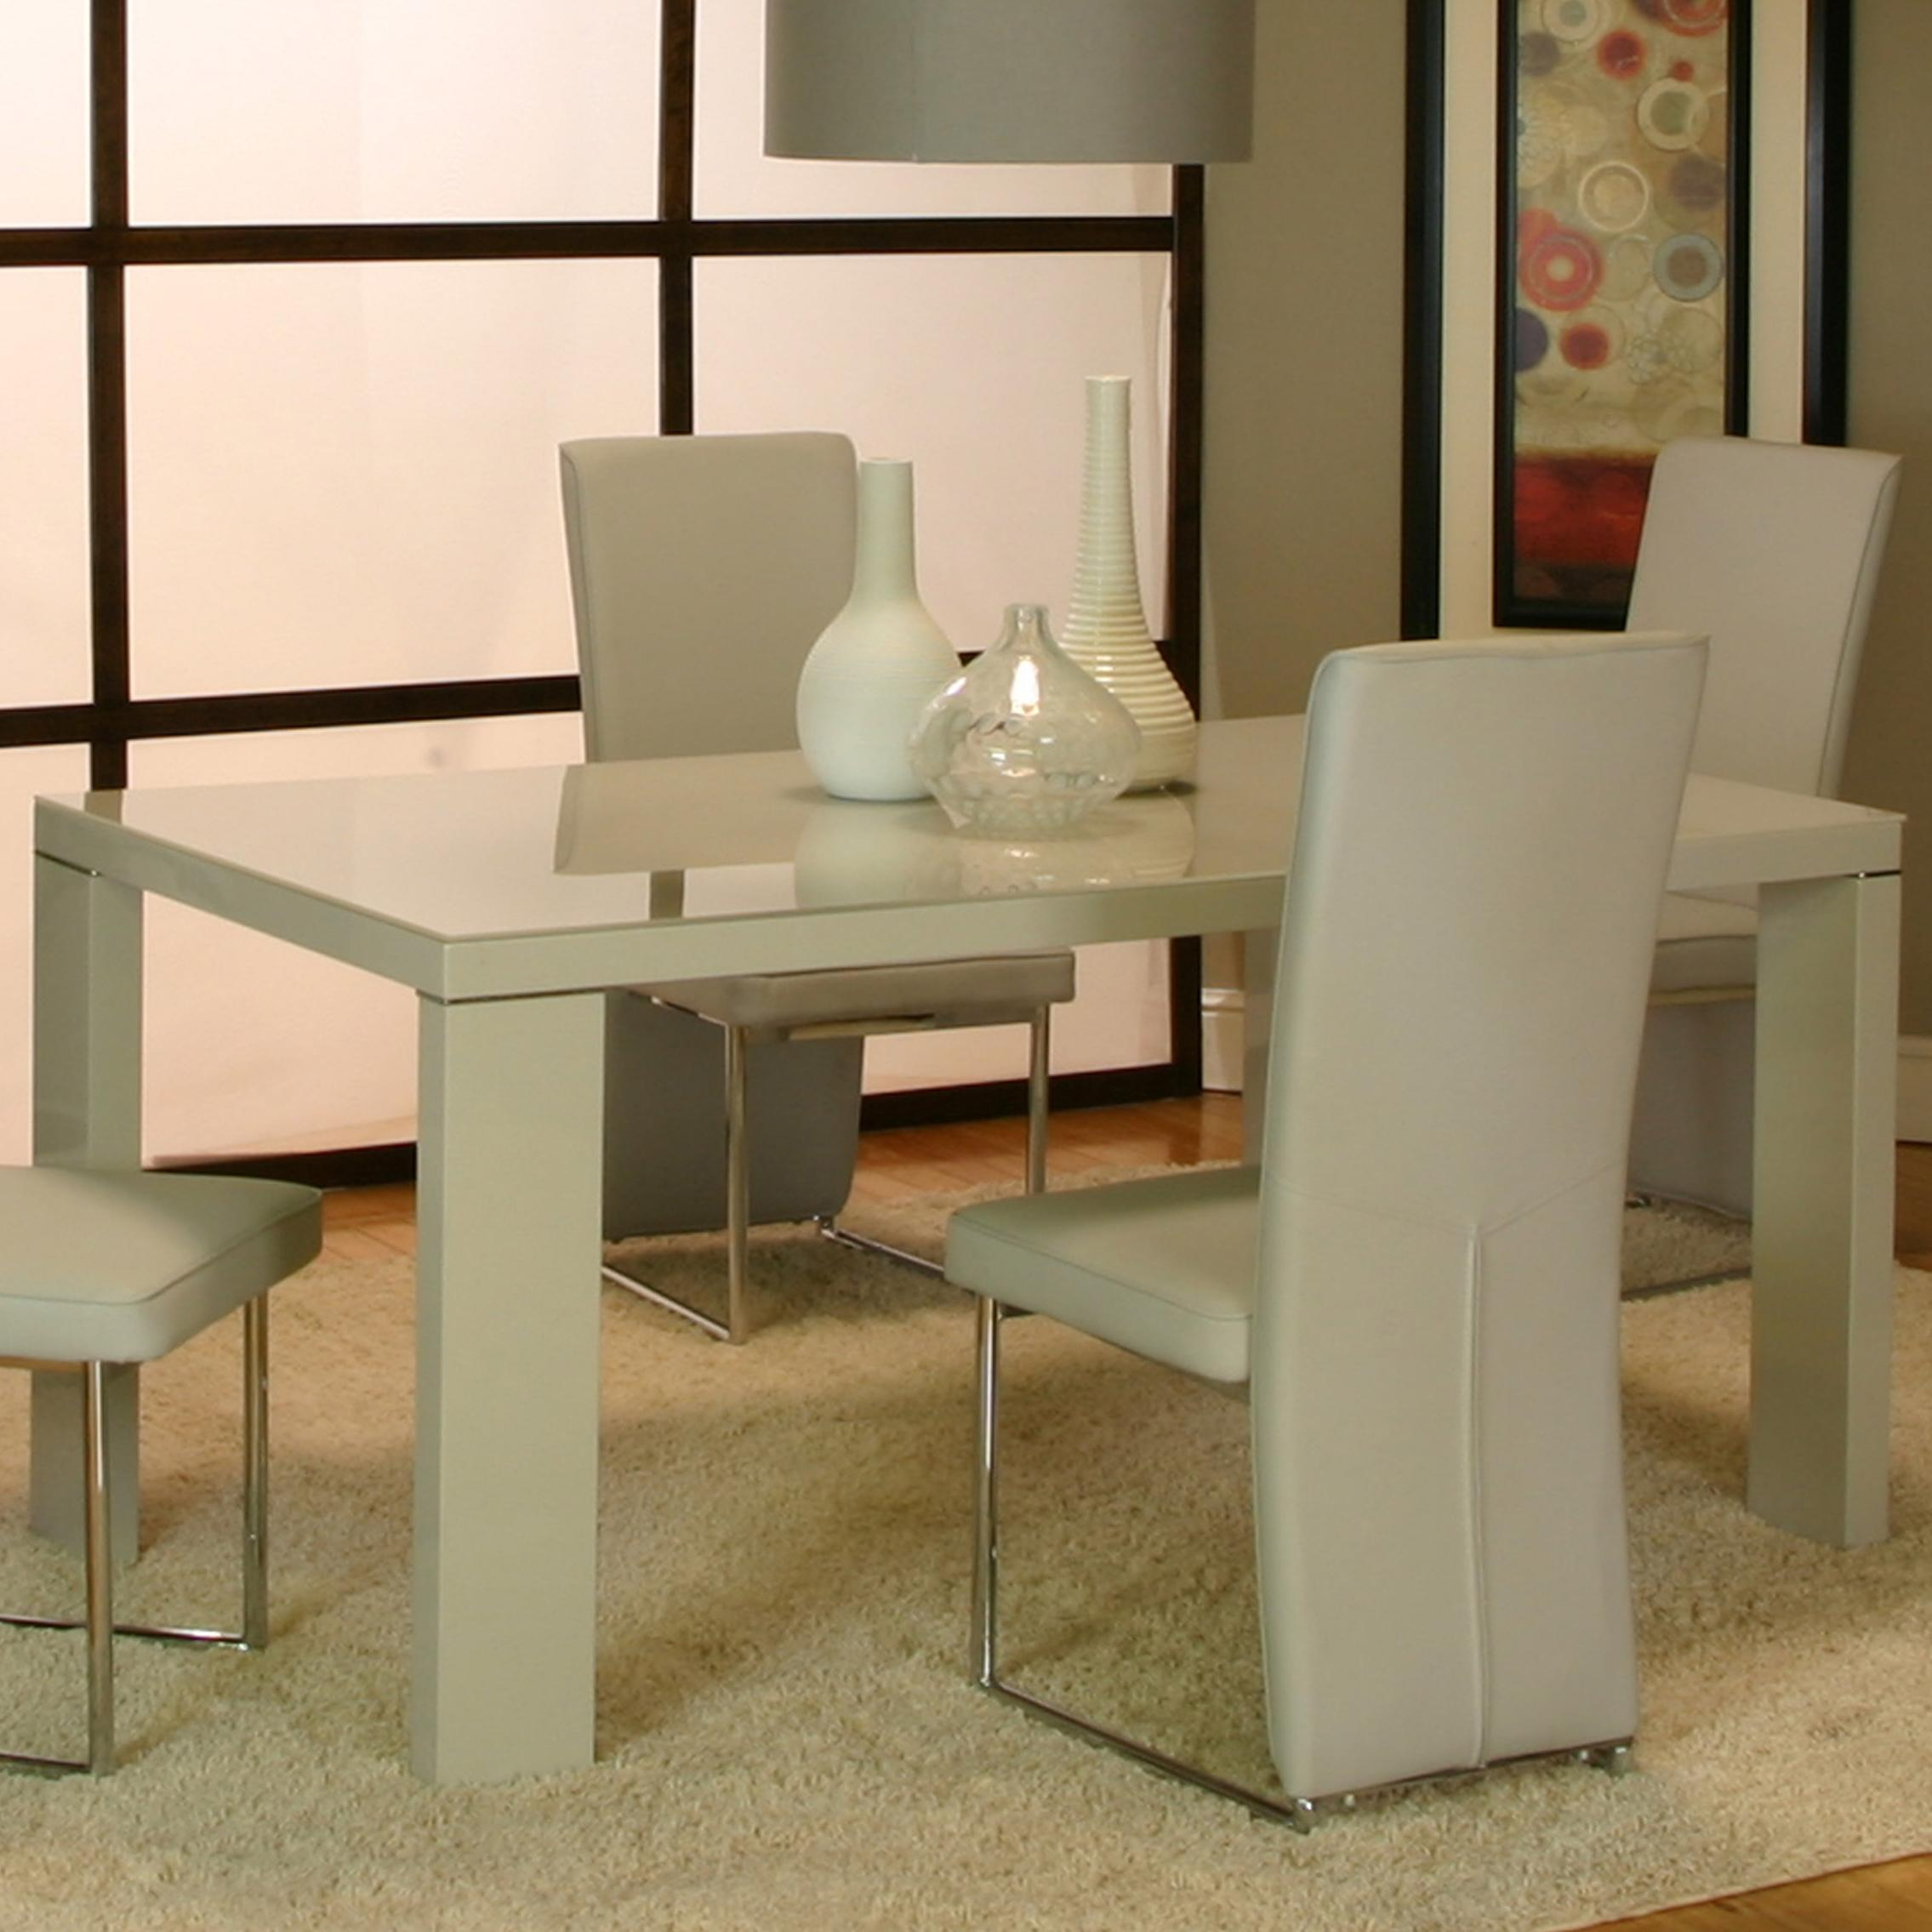 Cramco Inc Venice Rectangular Table Item Number G5777 47 41